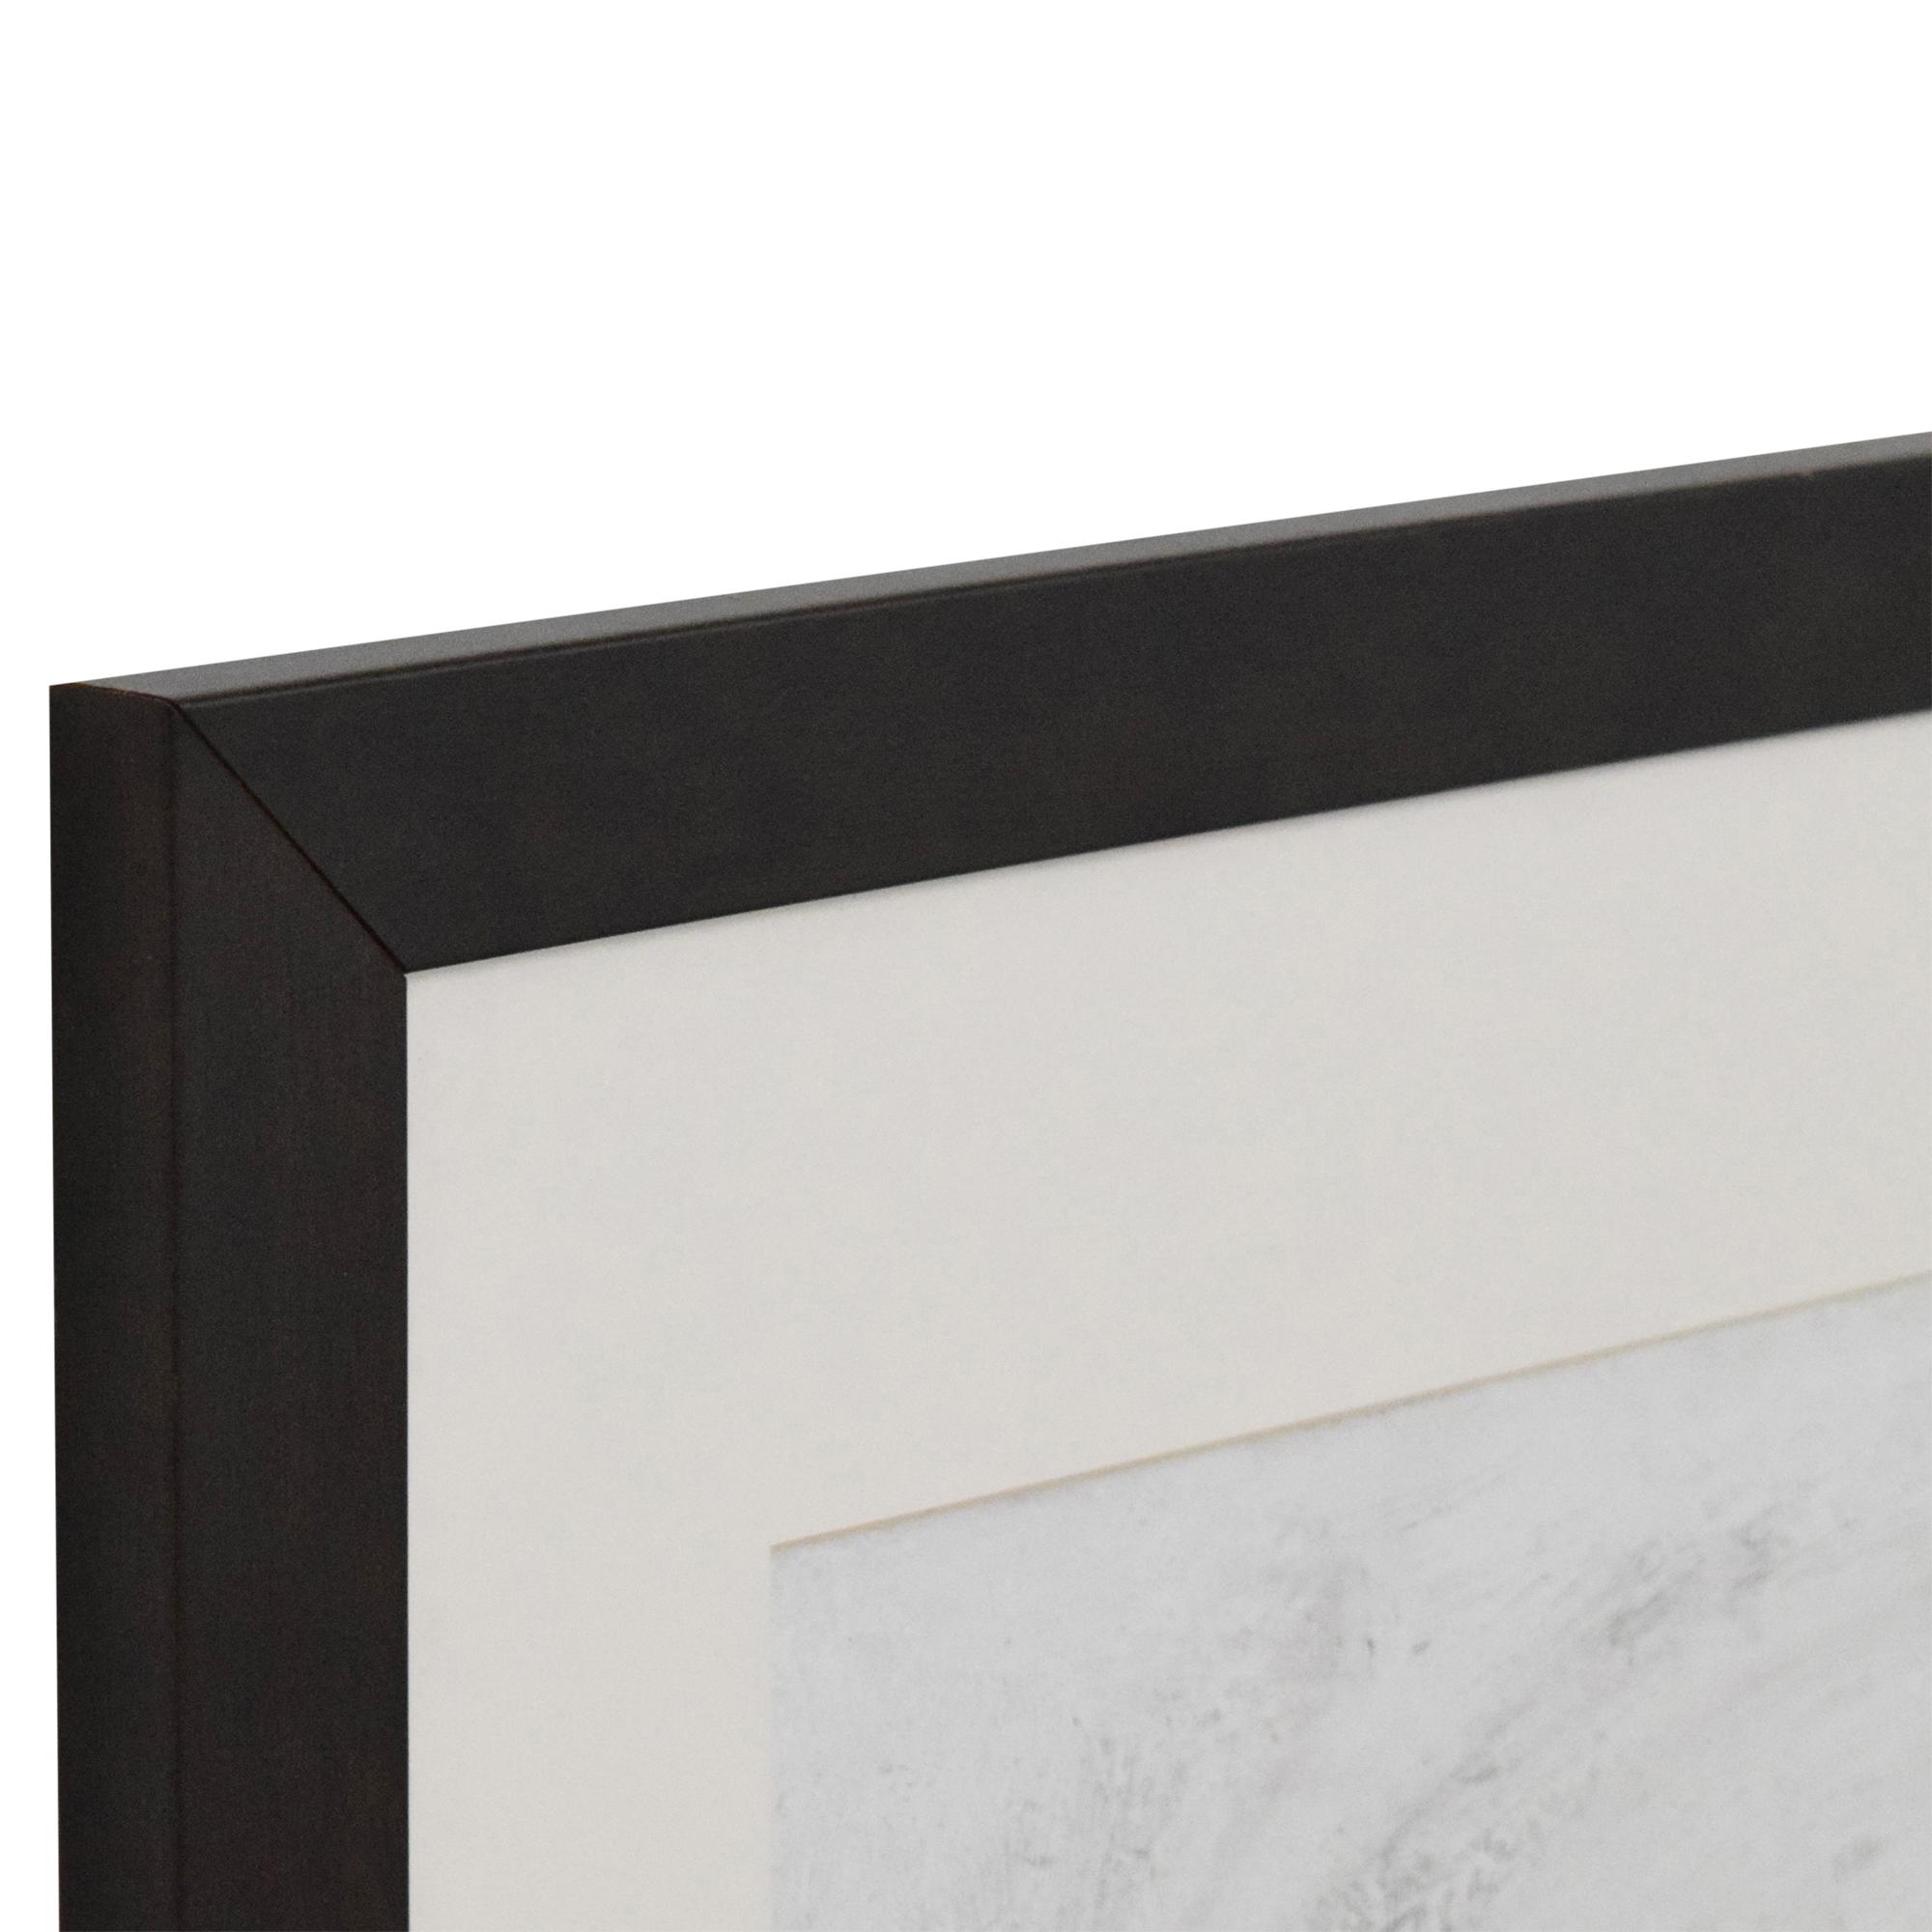 Philip Guston Framed Wall Art second hand